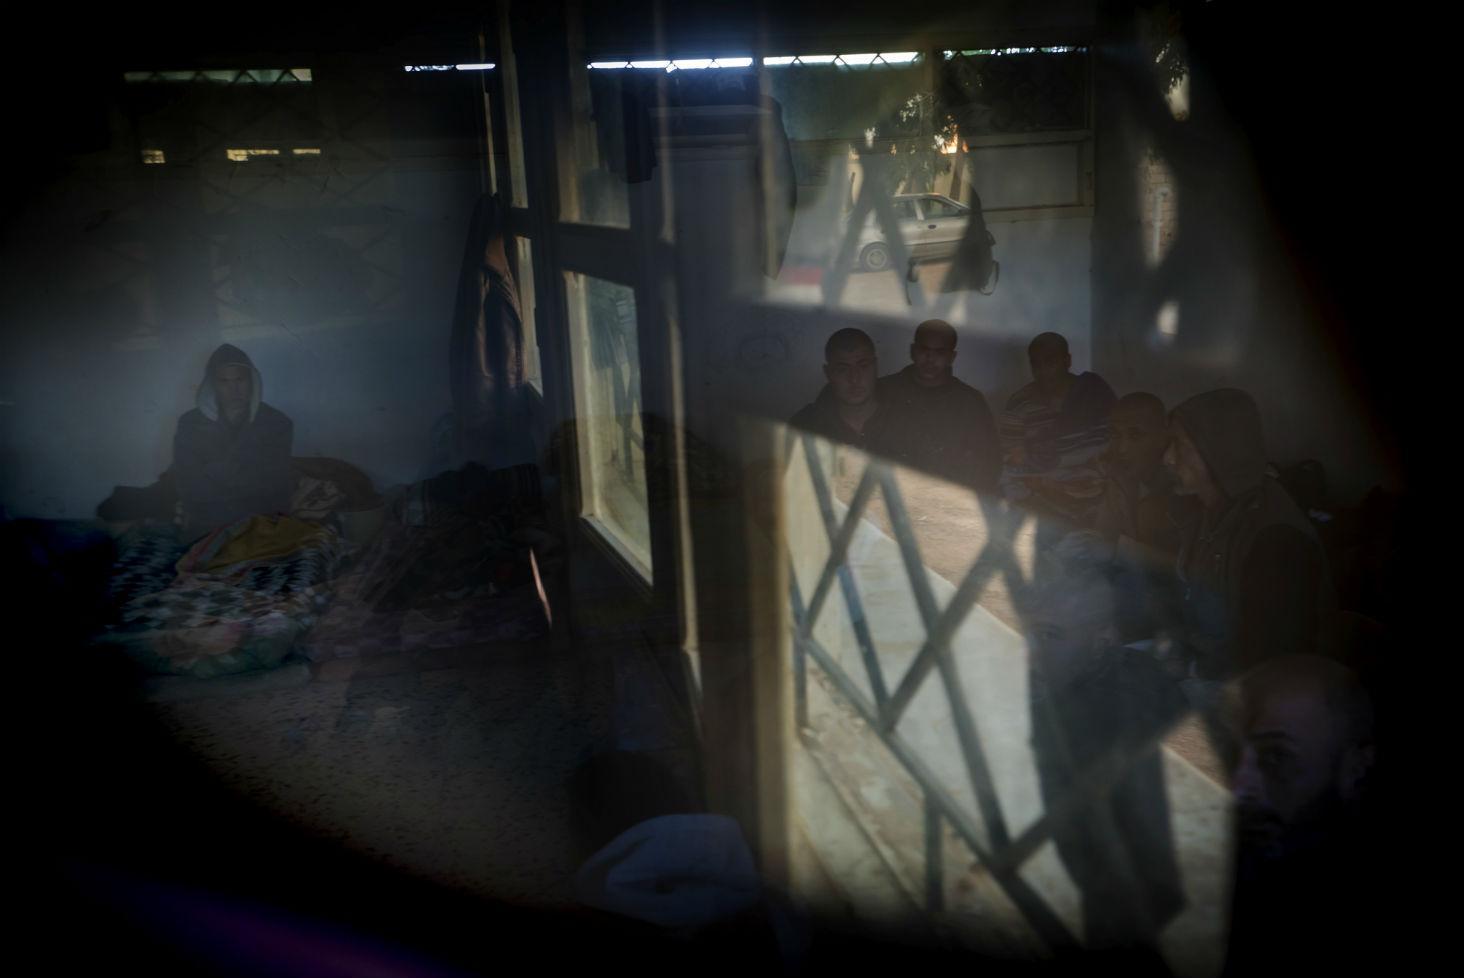 Foto: Ricardo Garcia Vilanova / MSF